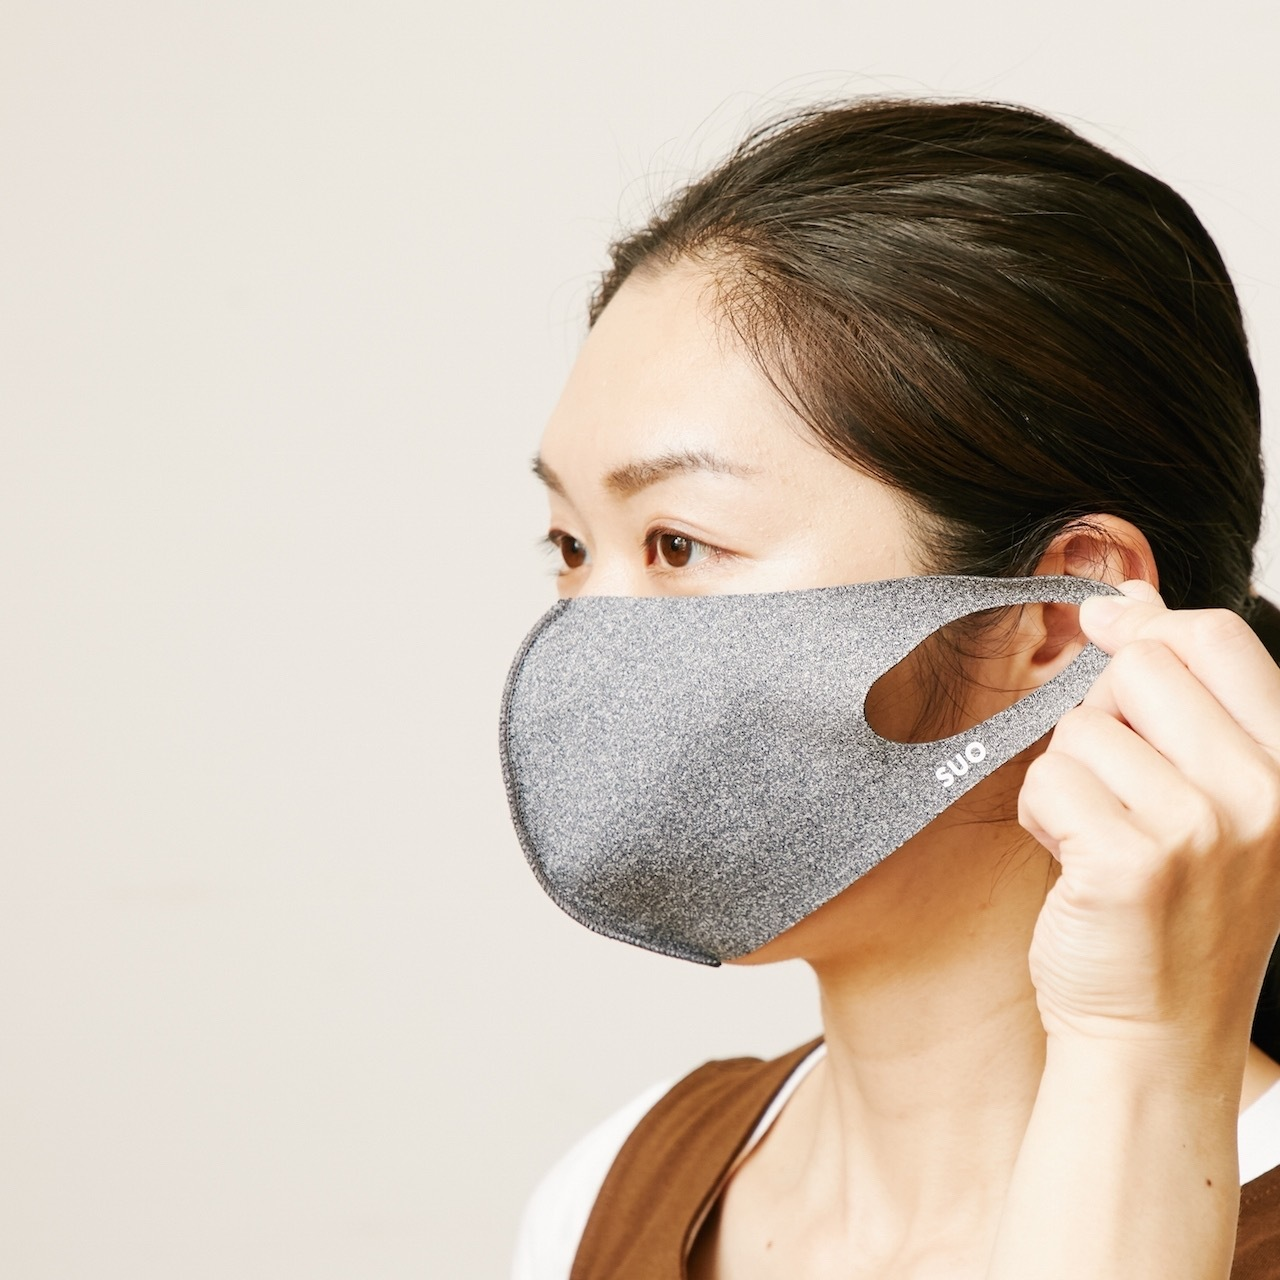 《SUO》COOL・スキンフィットマスク  HEATHER